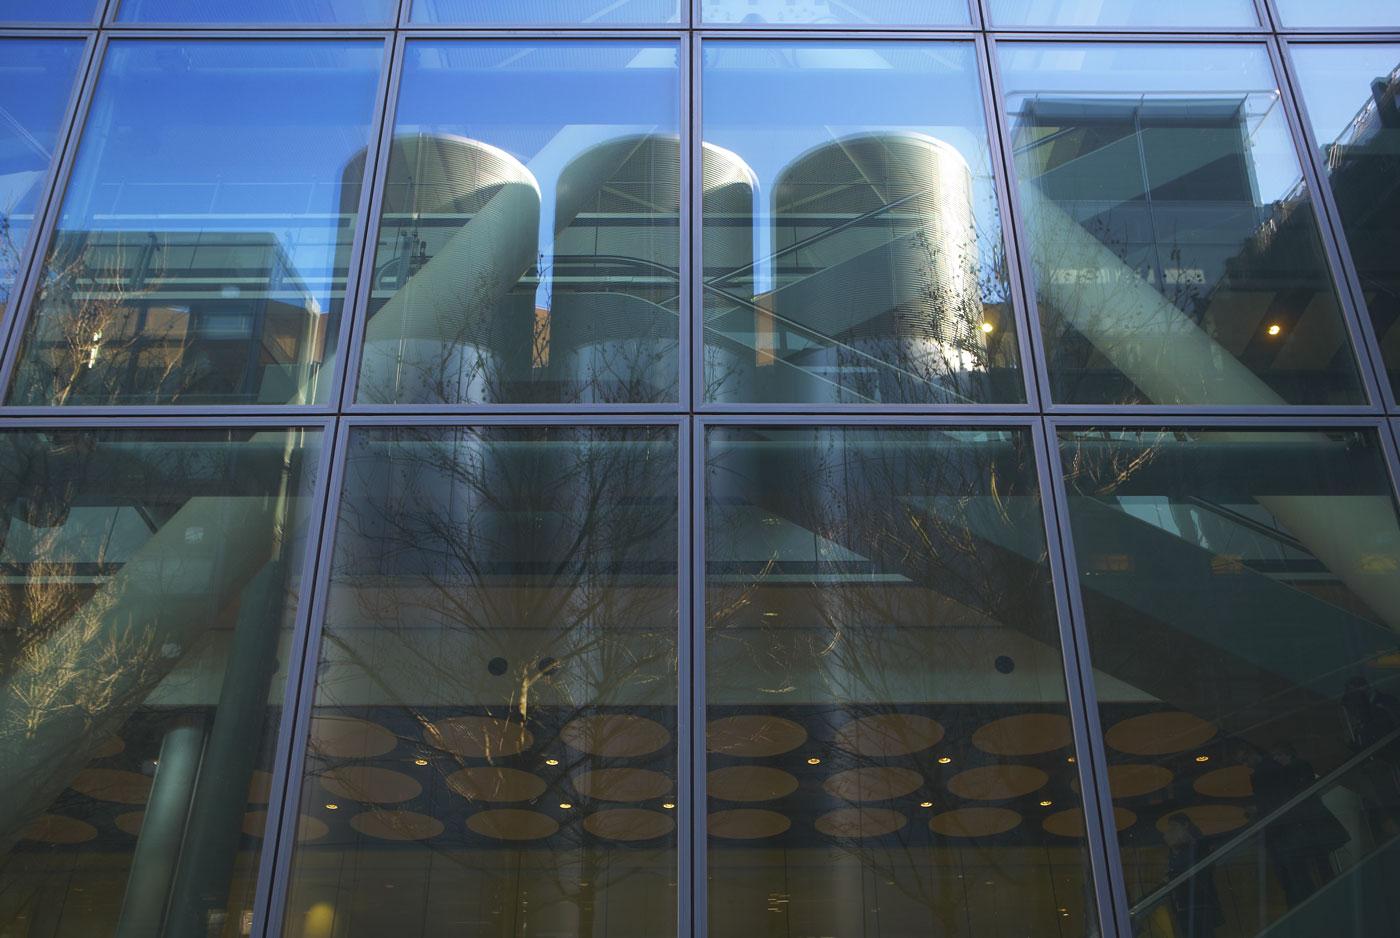 Heathrow Airport Terminal 5 glazed facade | Commercial Building Photographer